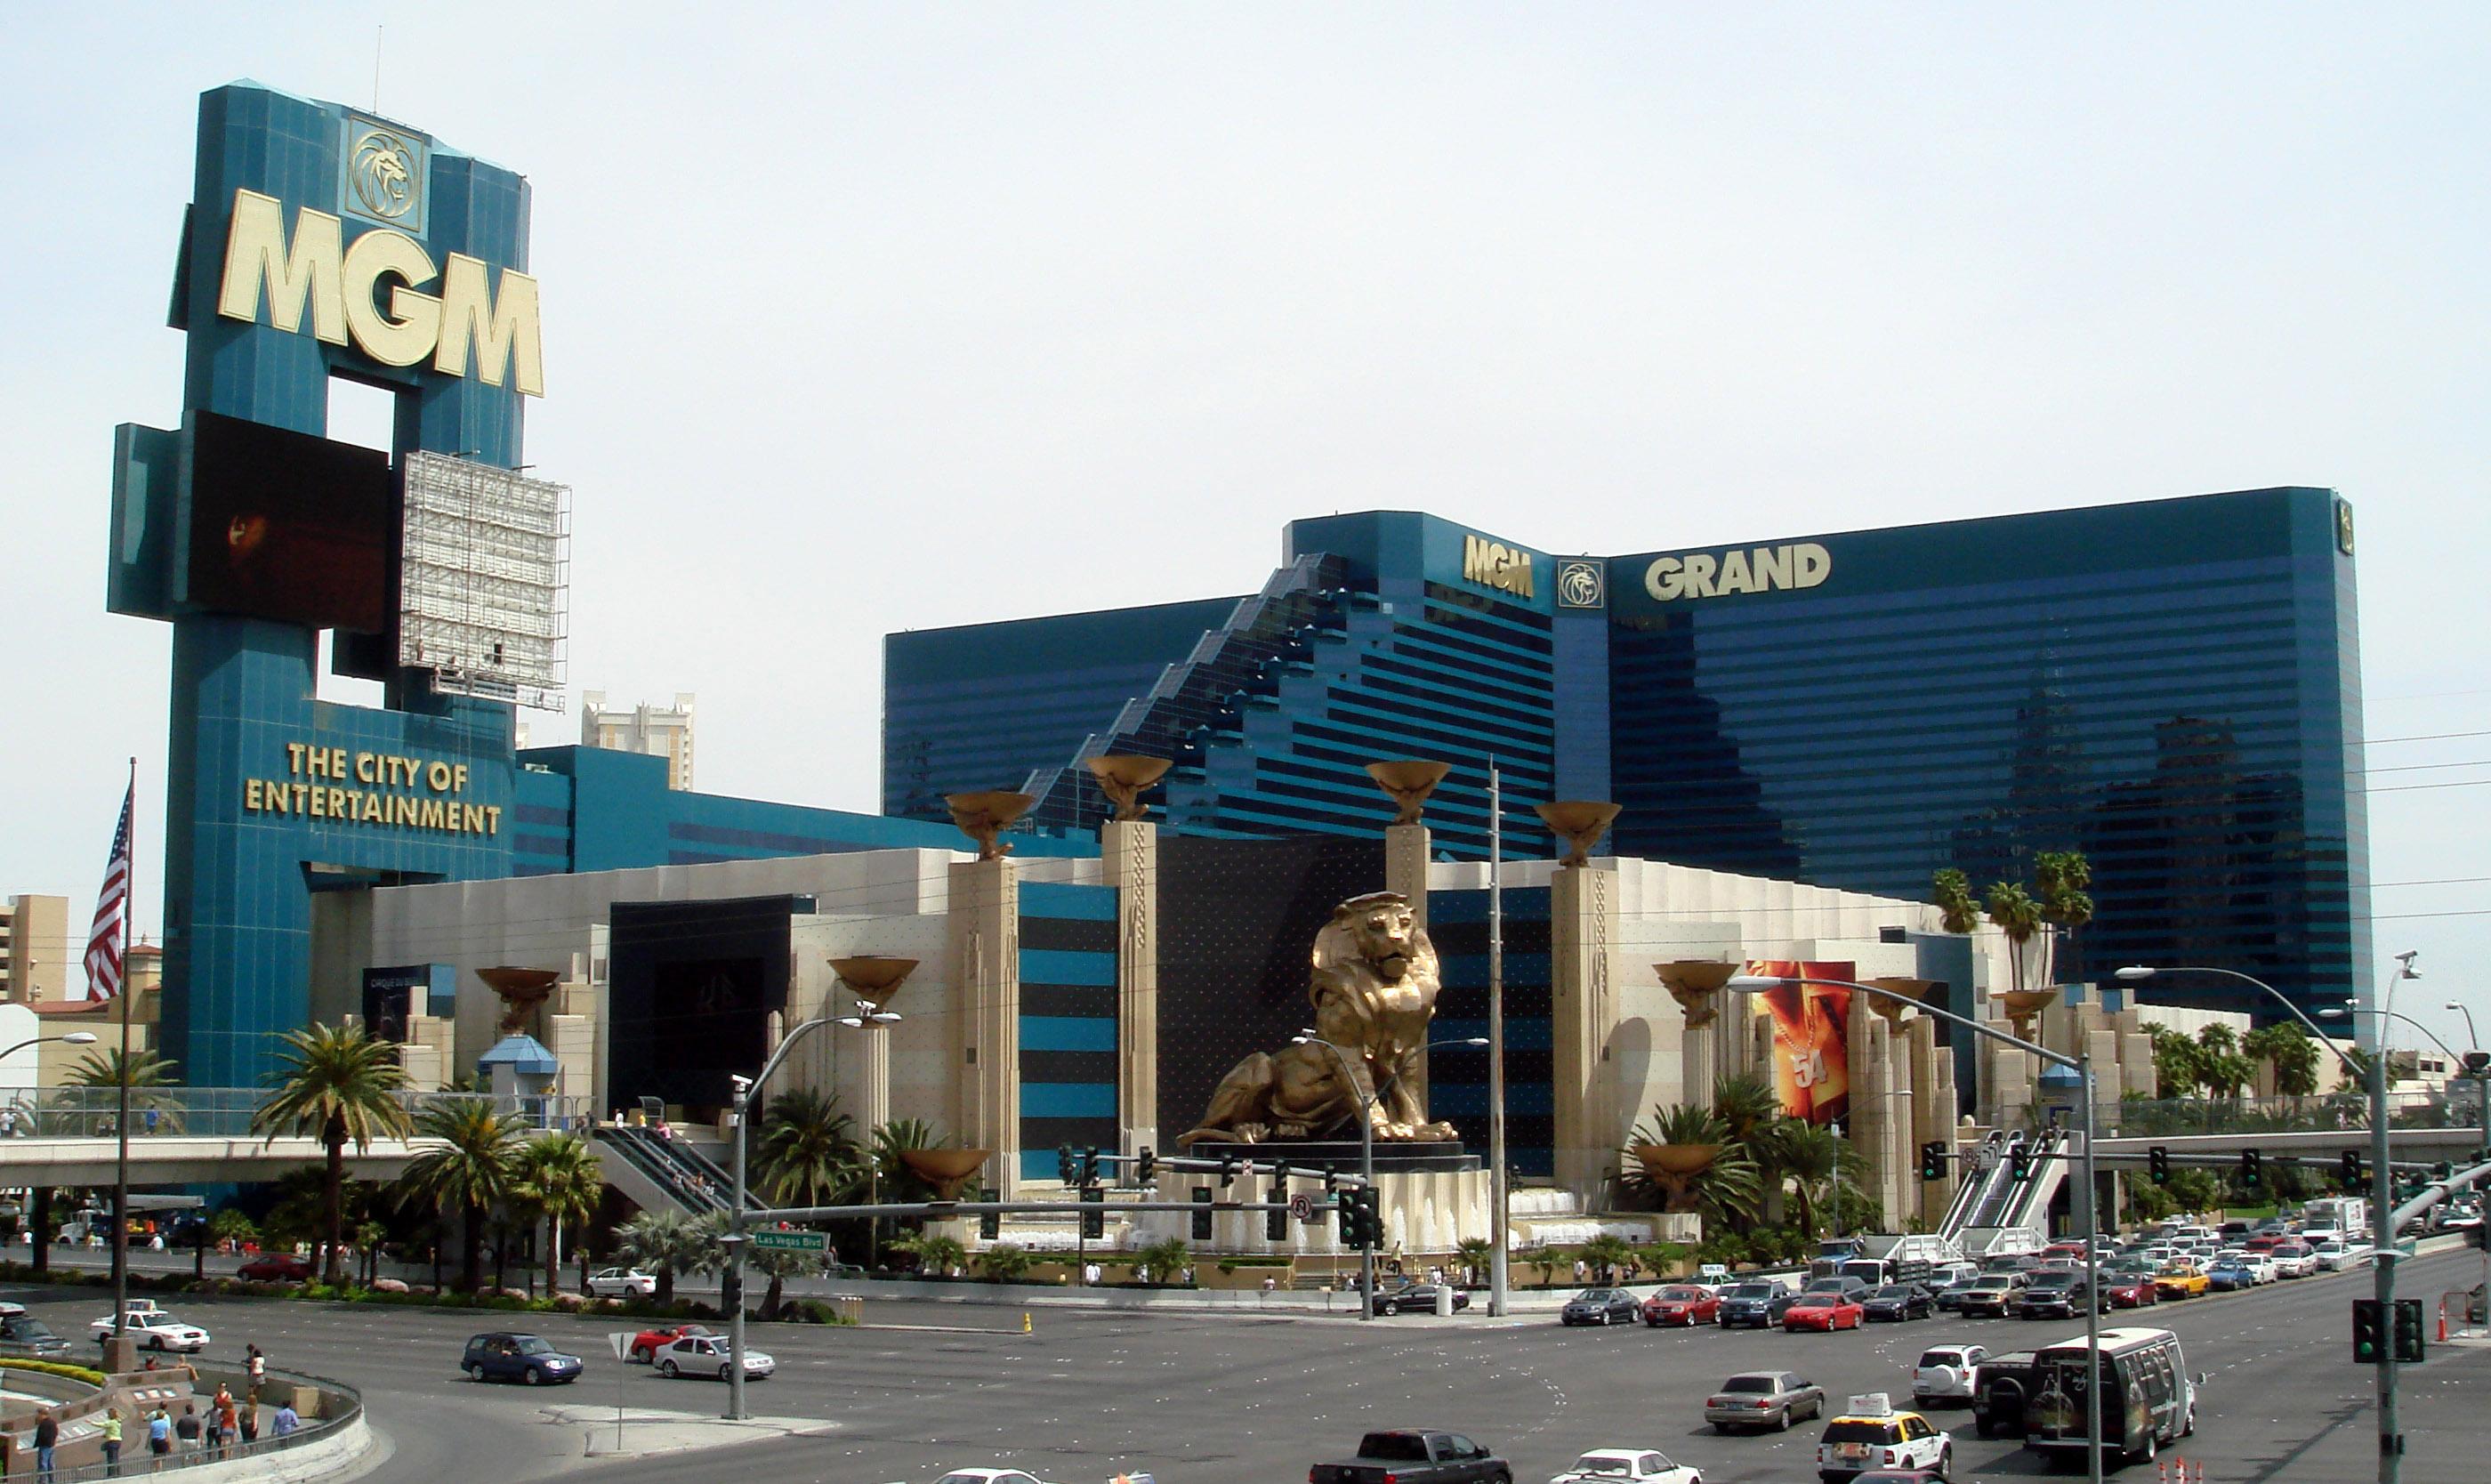 MGM Grand Hotel - Wikiwand